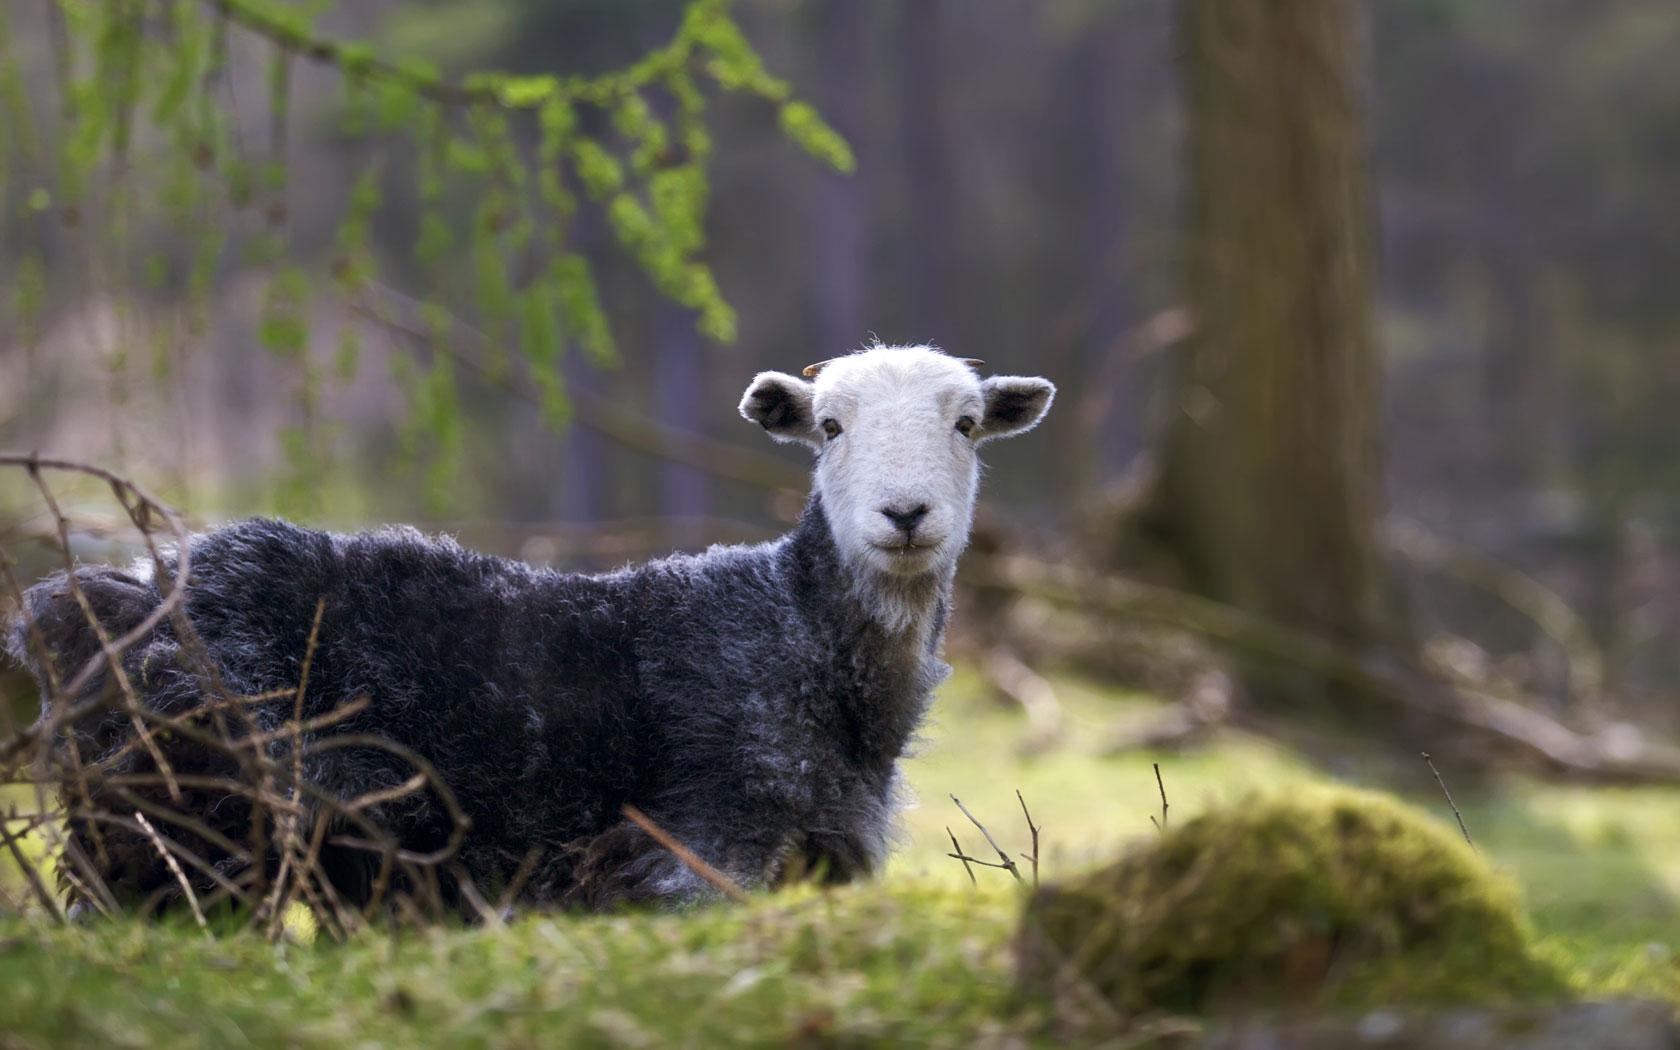 Free Download Black Sheep Wallpaper Black Sheep Desktop